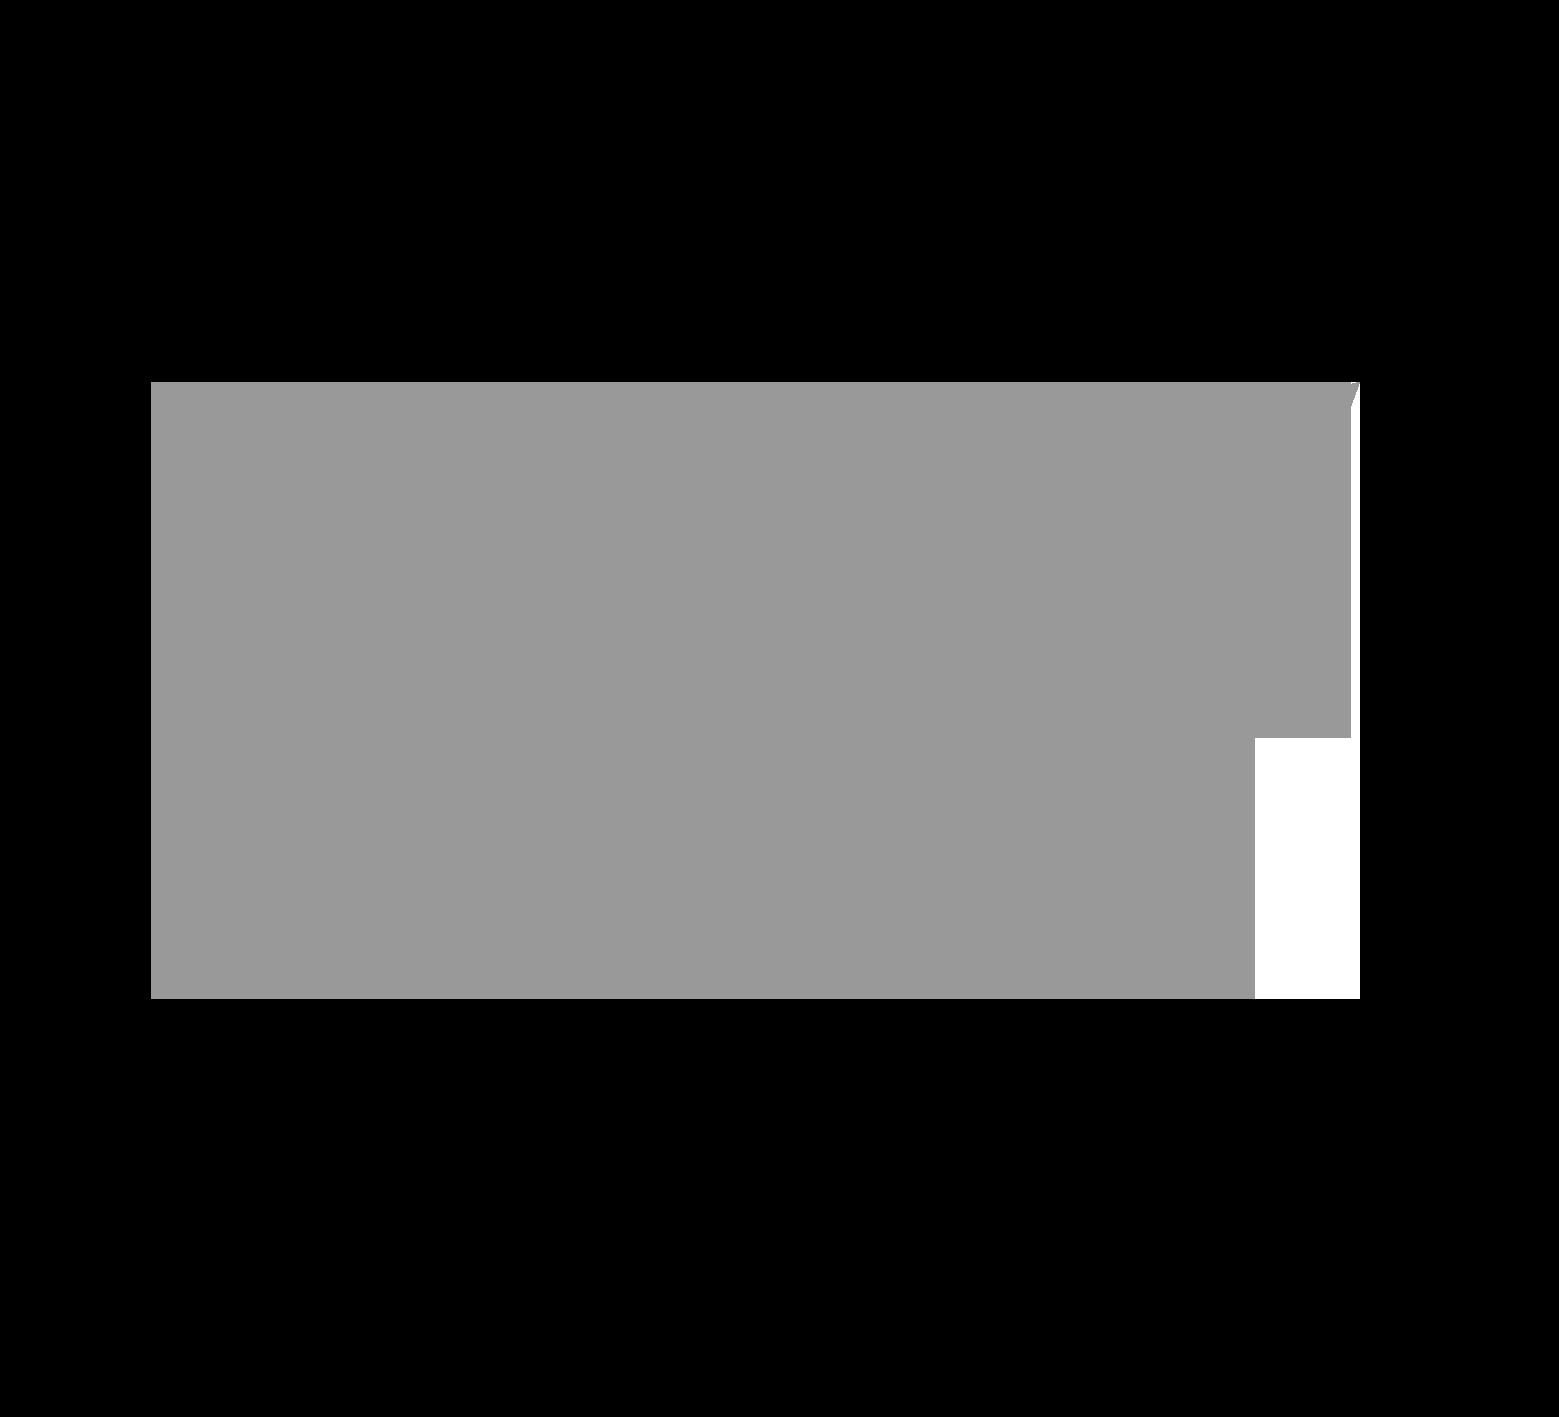 Bolting_bits_logo_